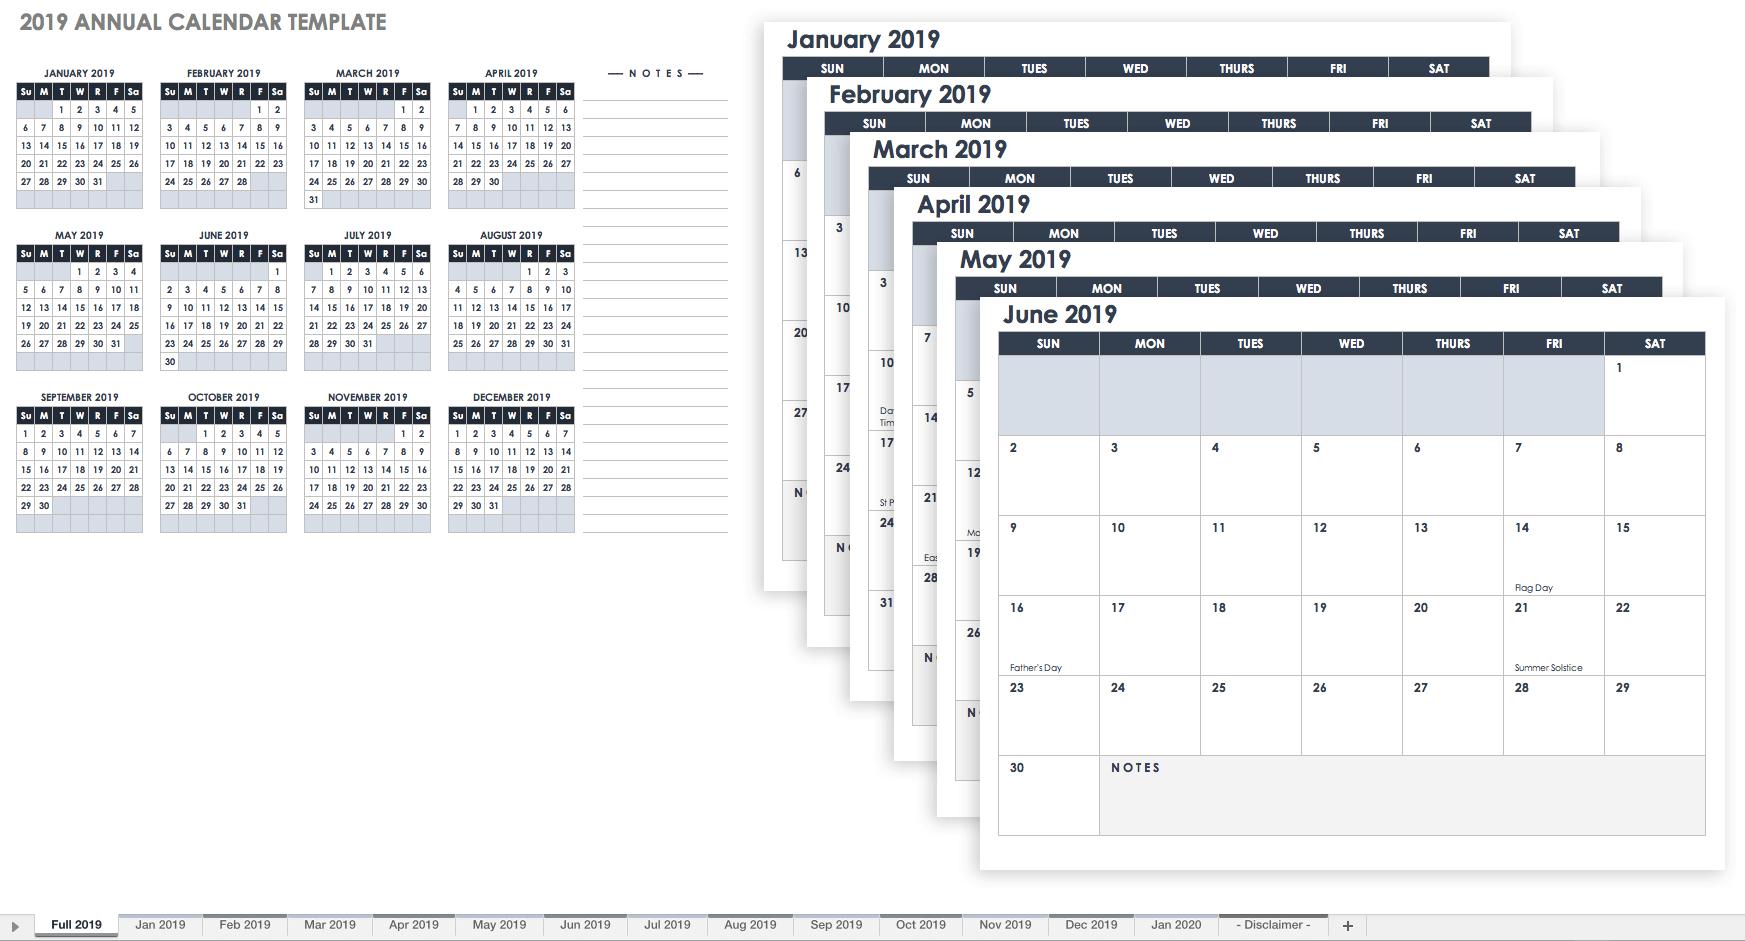 15 Free Monthly Calendar Templates | Smartsheet regarding Printable Year Calendar 2019 - 2020 With Space To Write